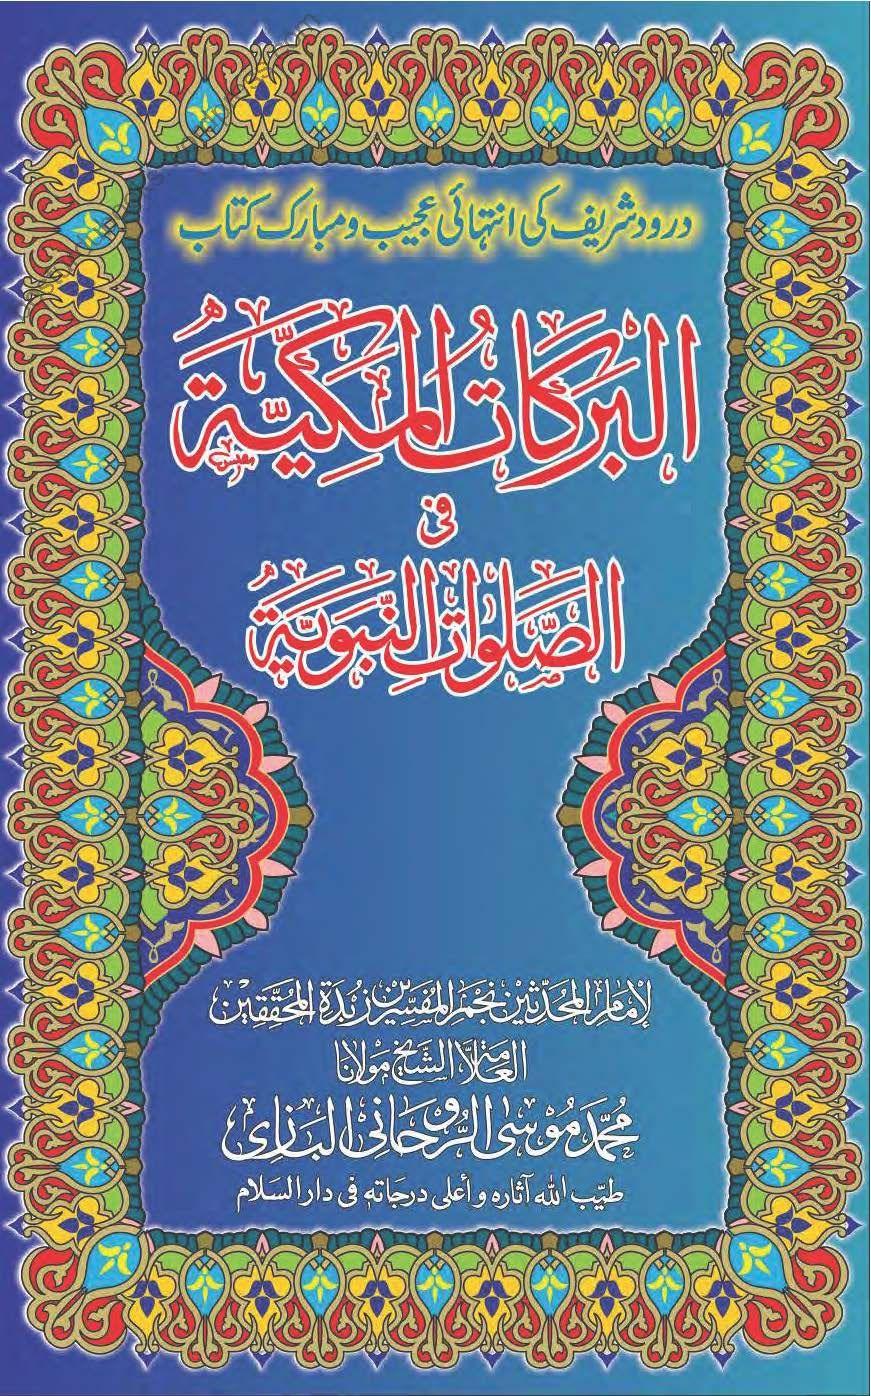 masnoon Dua parhen jannat me ghar banaye book is written by Muhammad